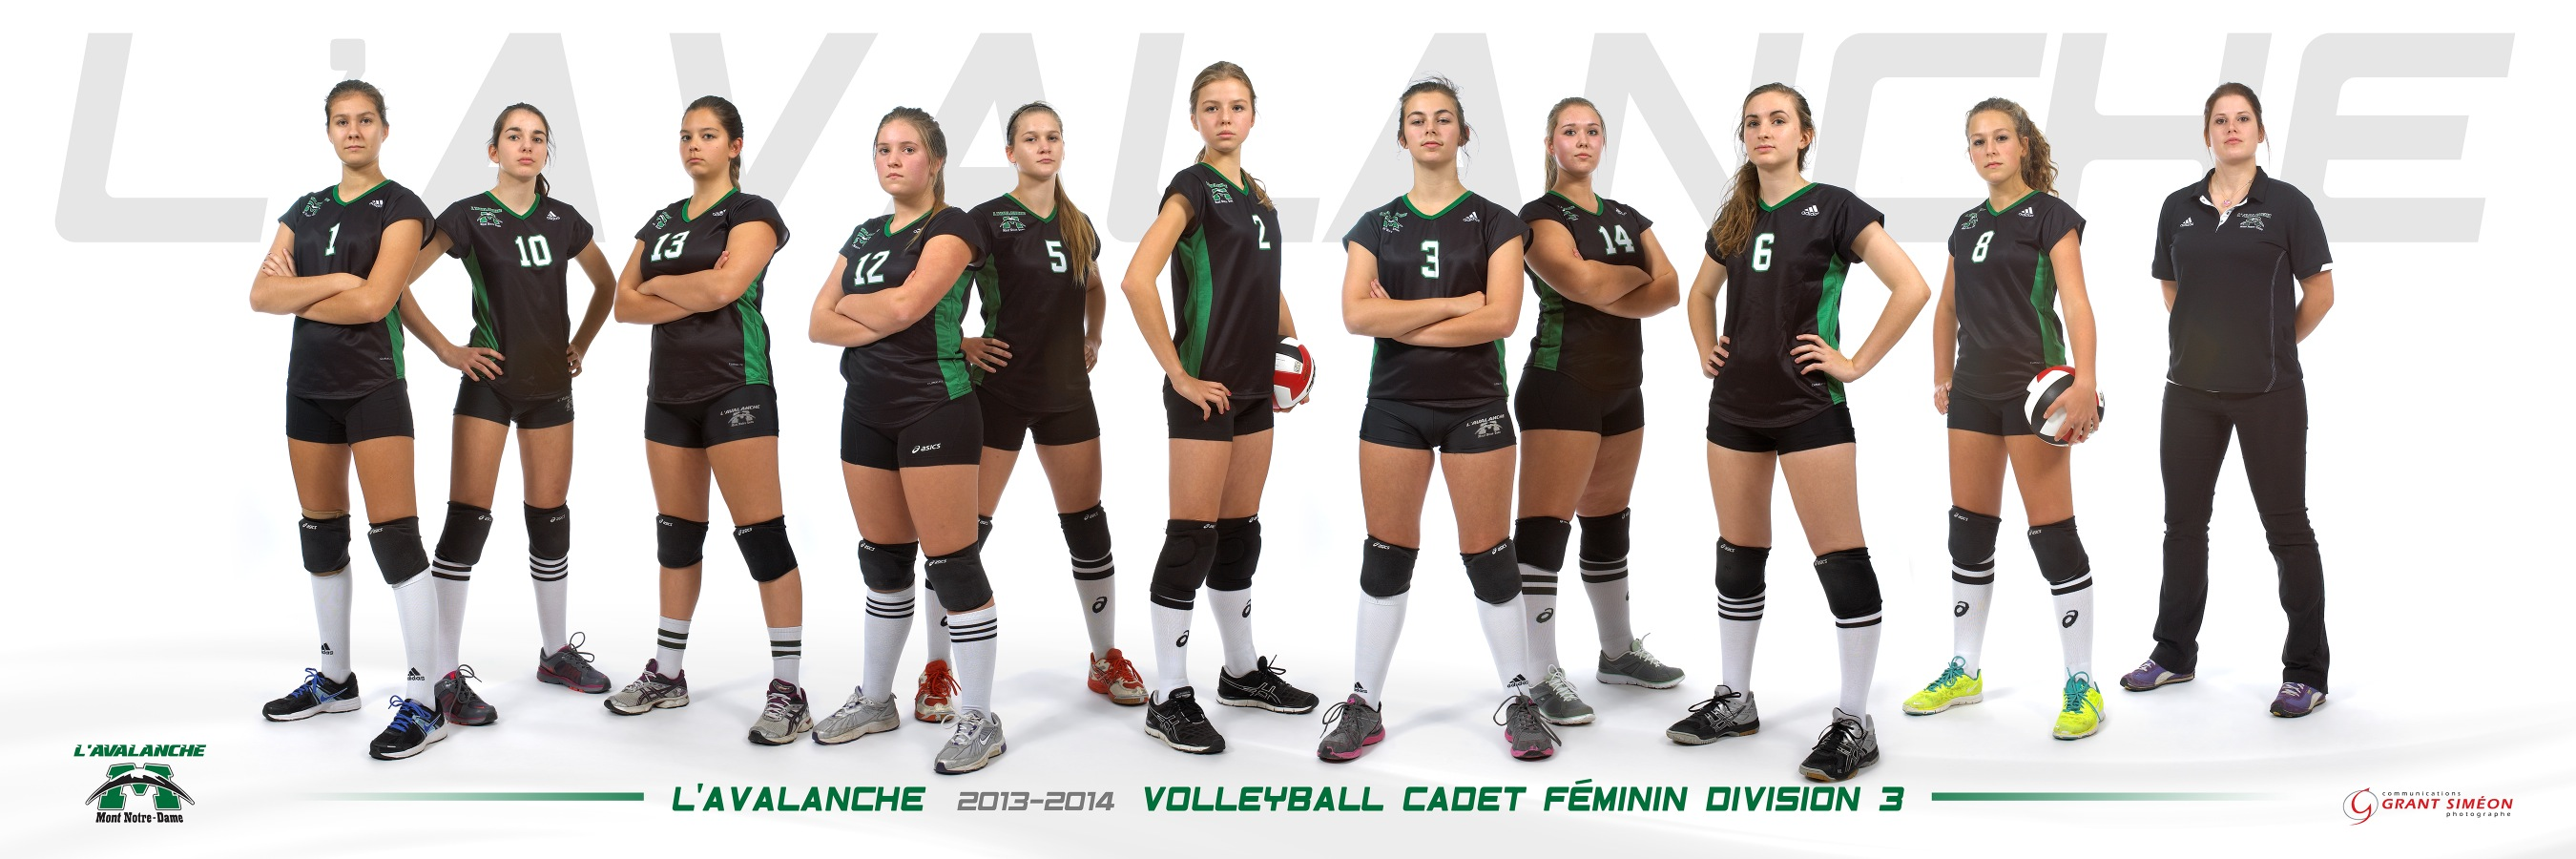 cmnd_volleyball-cadette-div-3-2013-2014